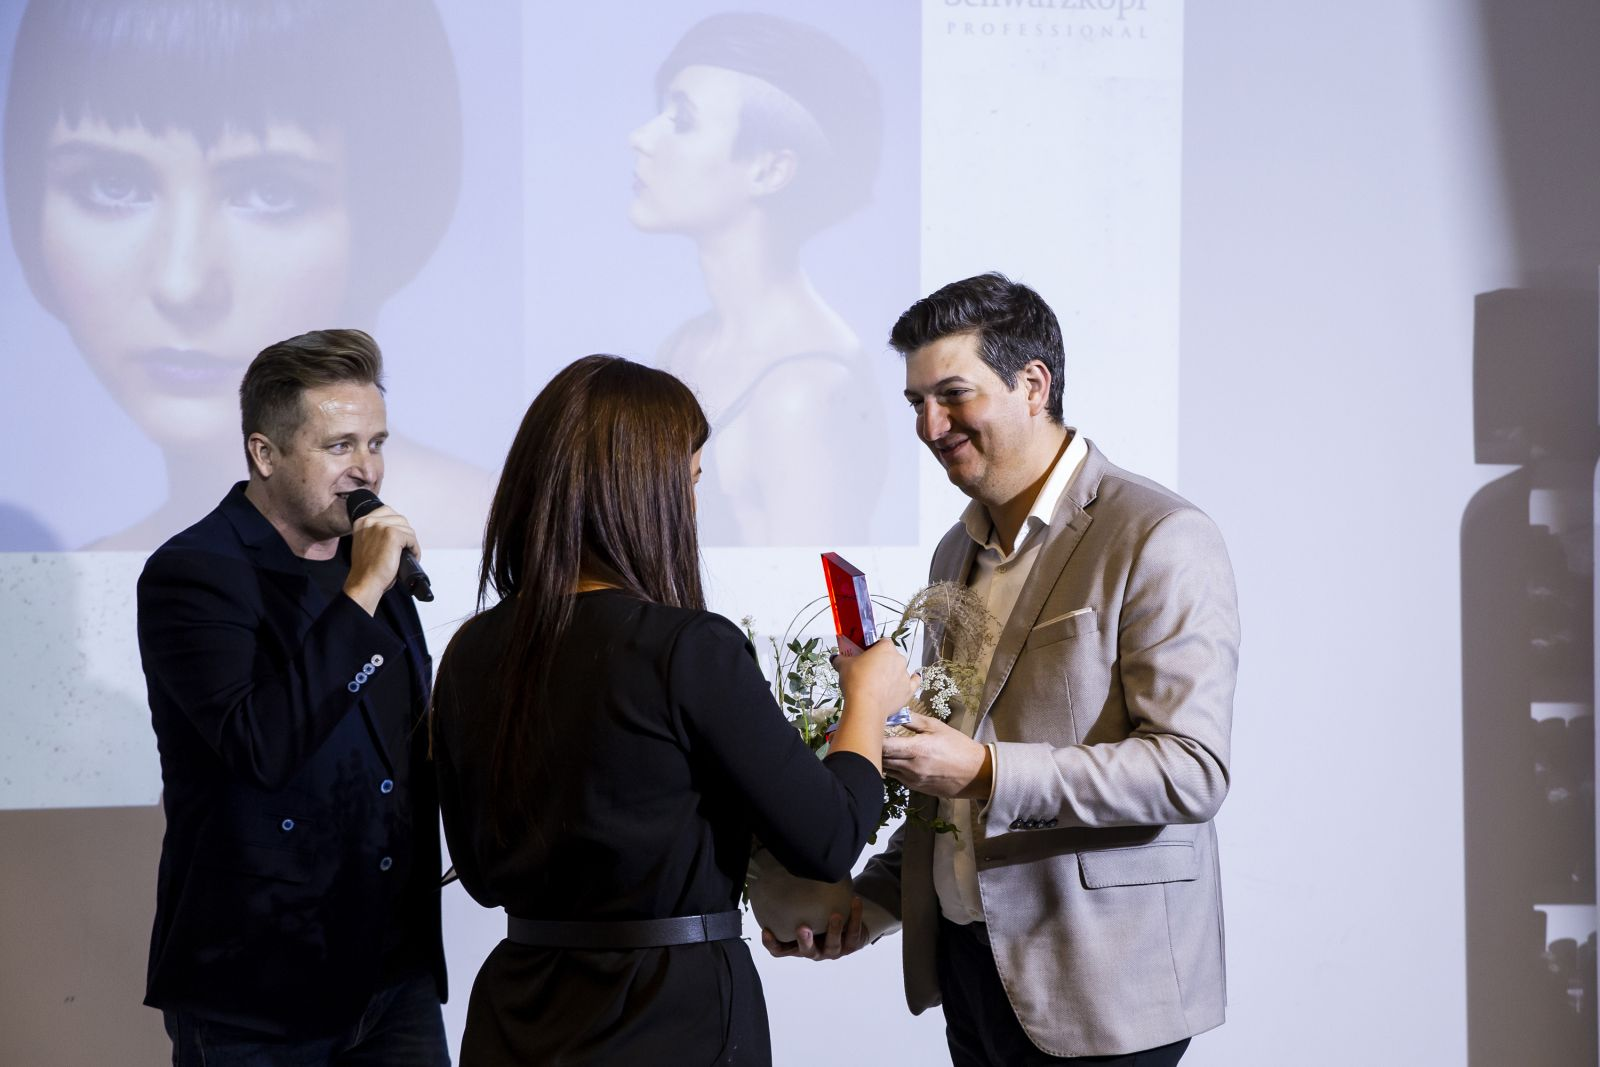 osis made to create, schwarzkopf professional, online időpontfoglaló program_bwnet